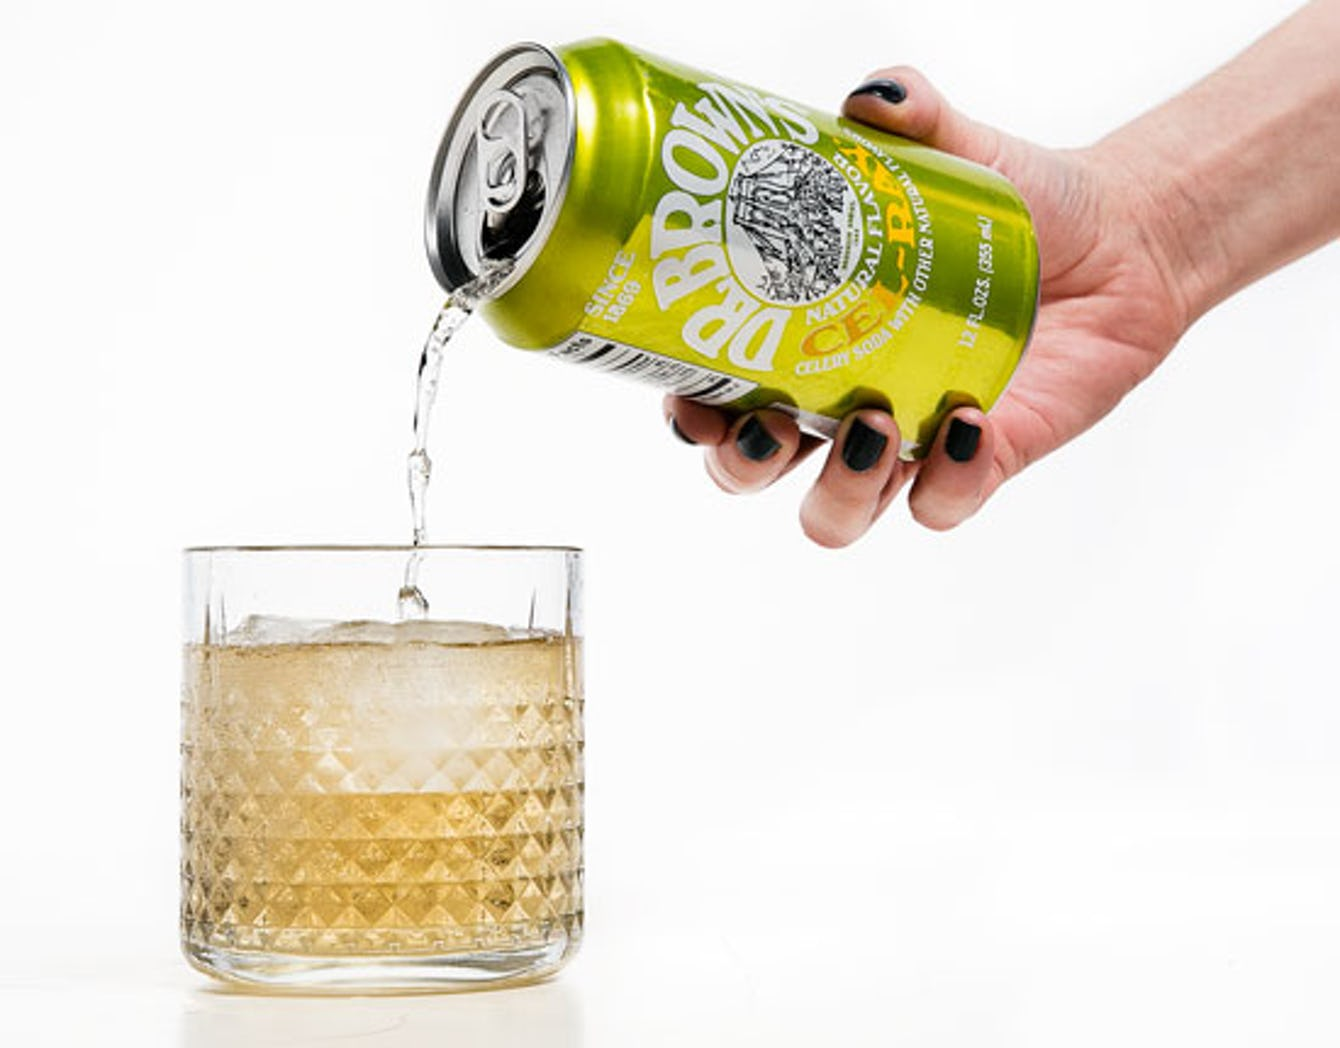 Web-Article-Dr-Browns-Cel-Ray-Celery-Soda.jpg